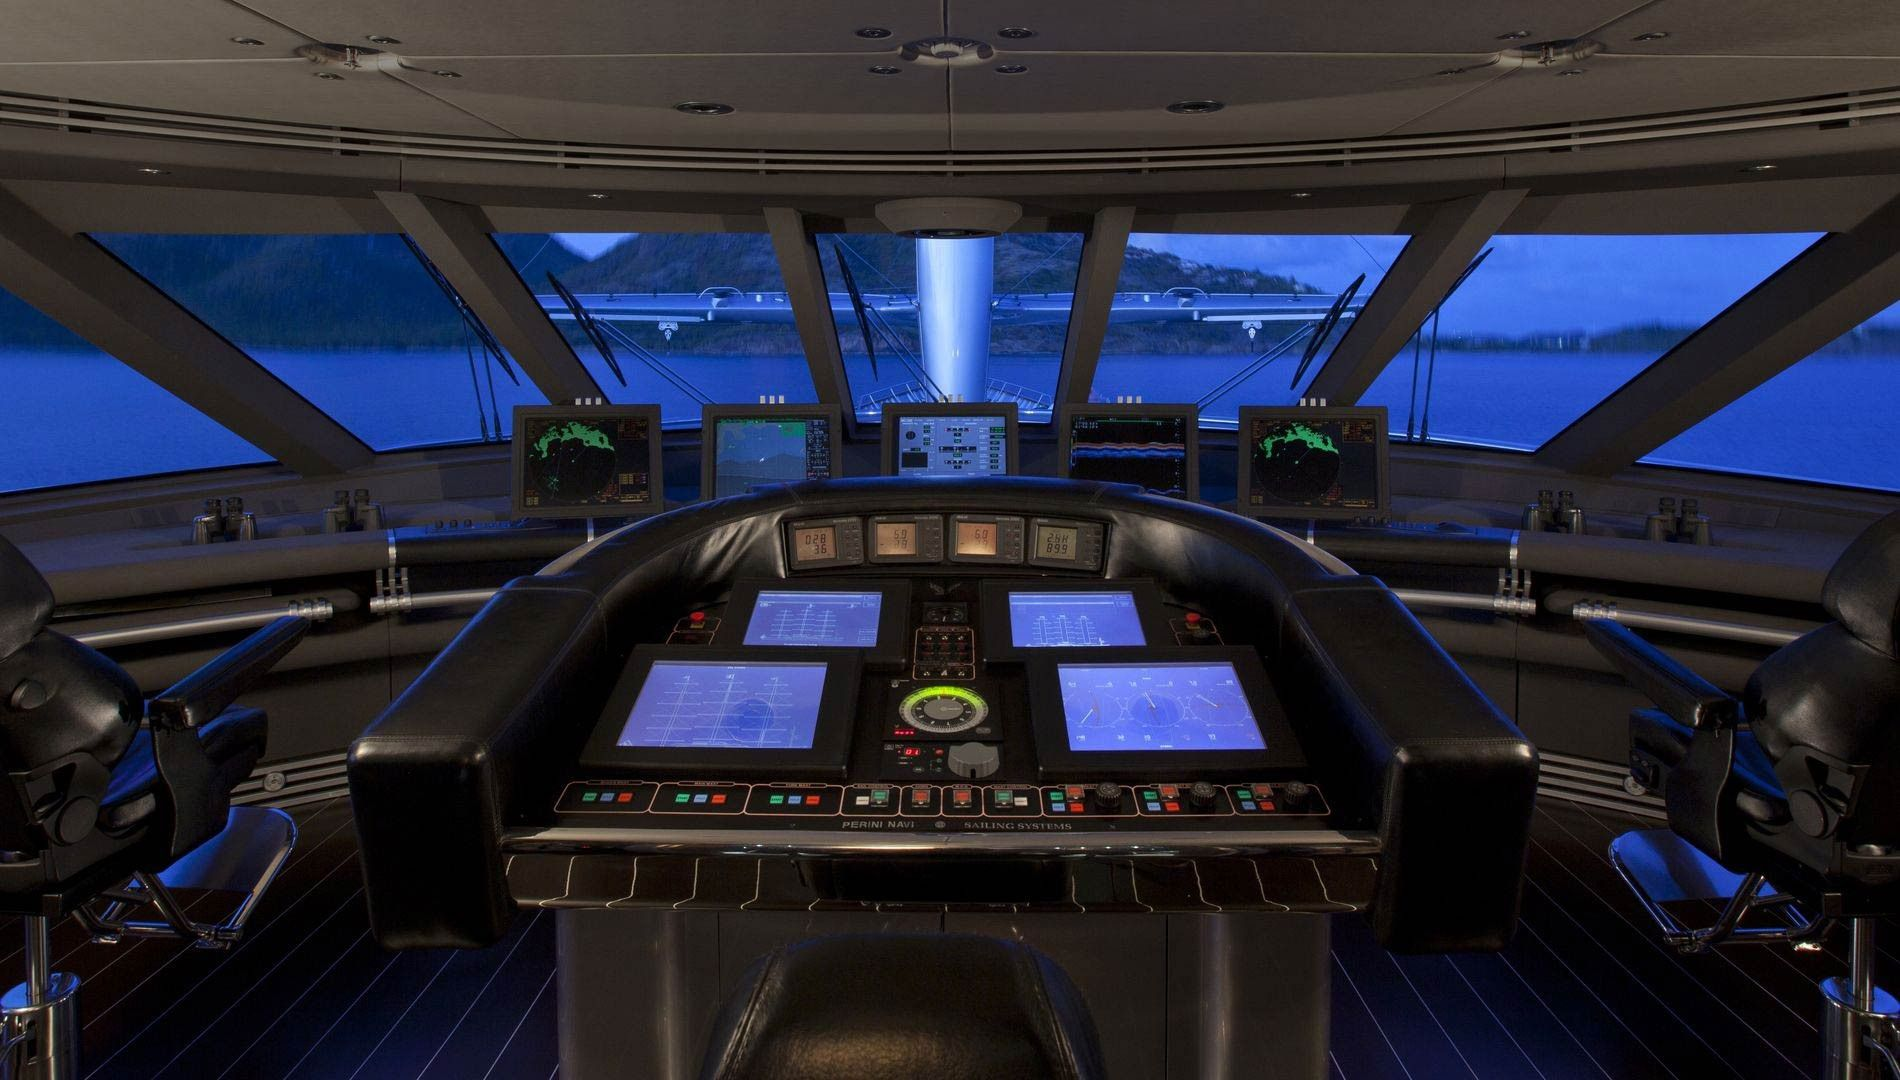 Maltese Falcon Superyacht Luxury Sail Yacht For Charter With Burgess Yacht Yacht Interior Sailing Yacht